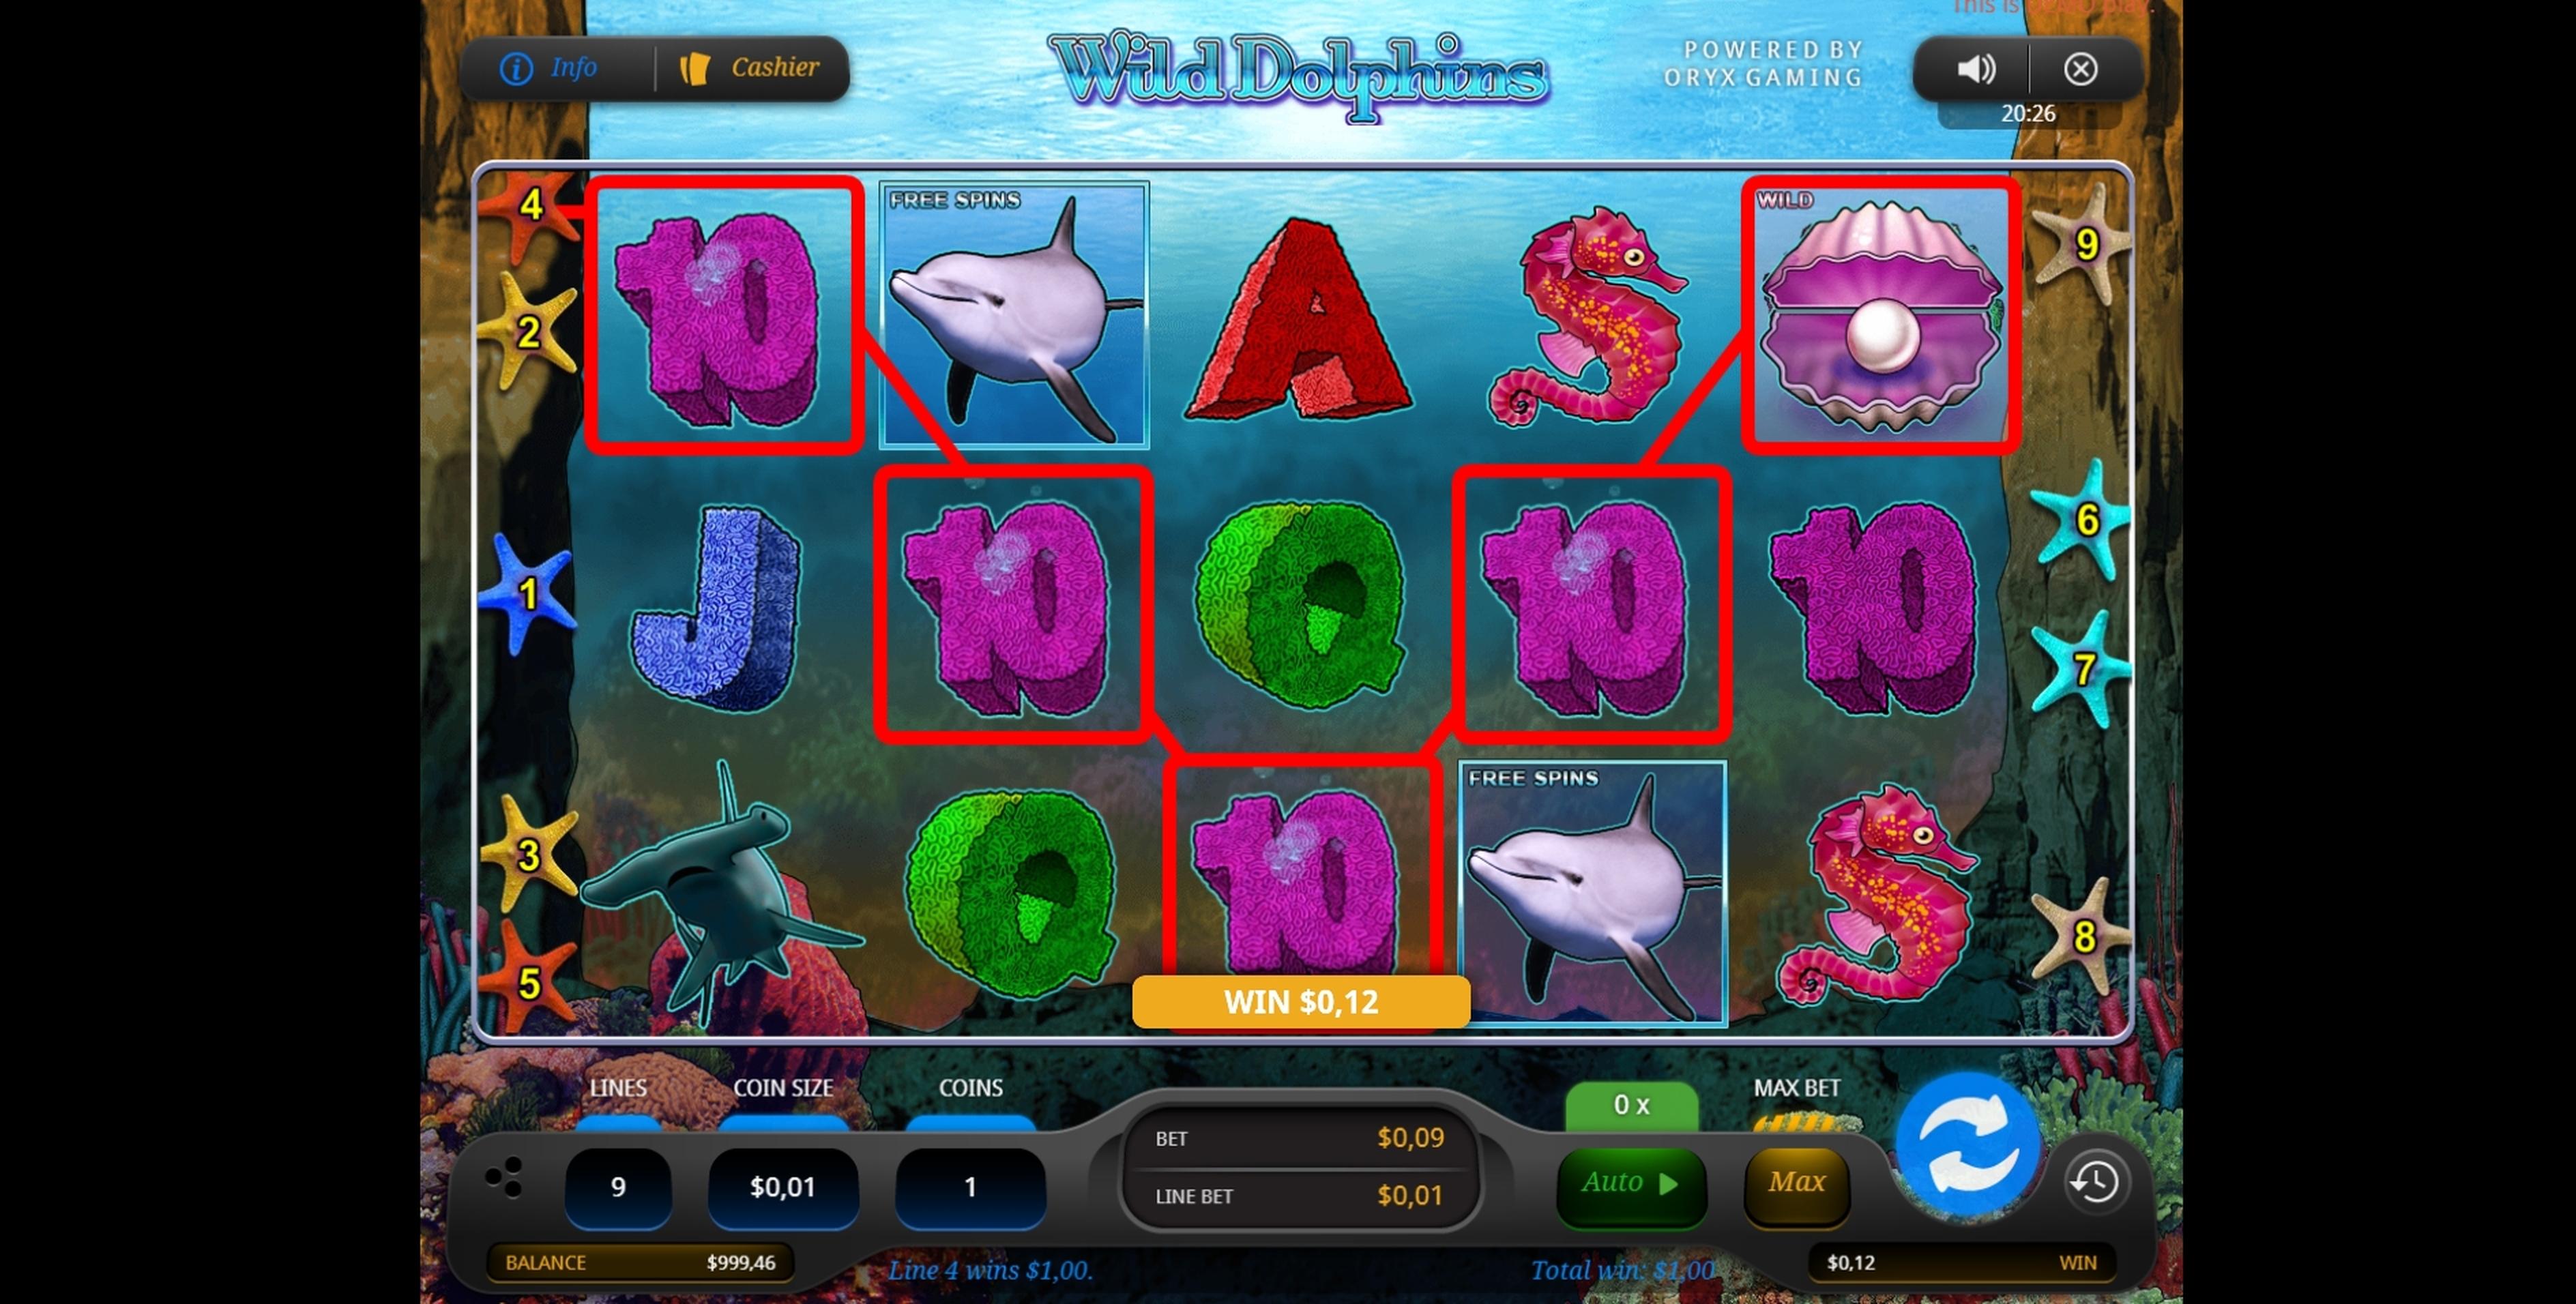 Wild Dolphin Slot Machine